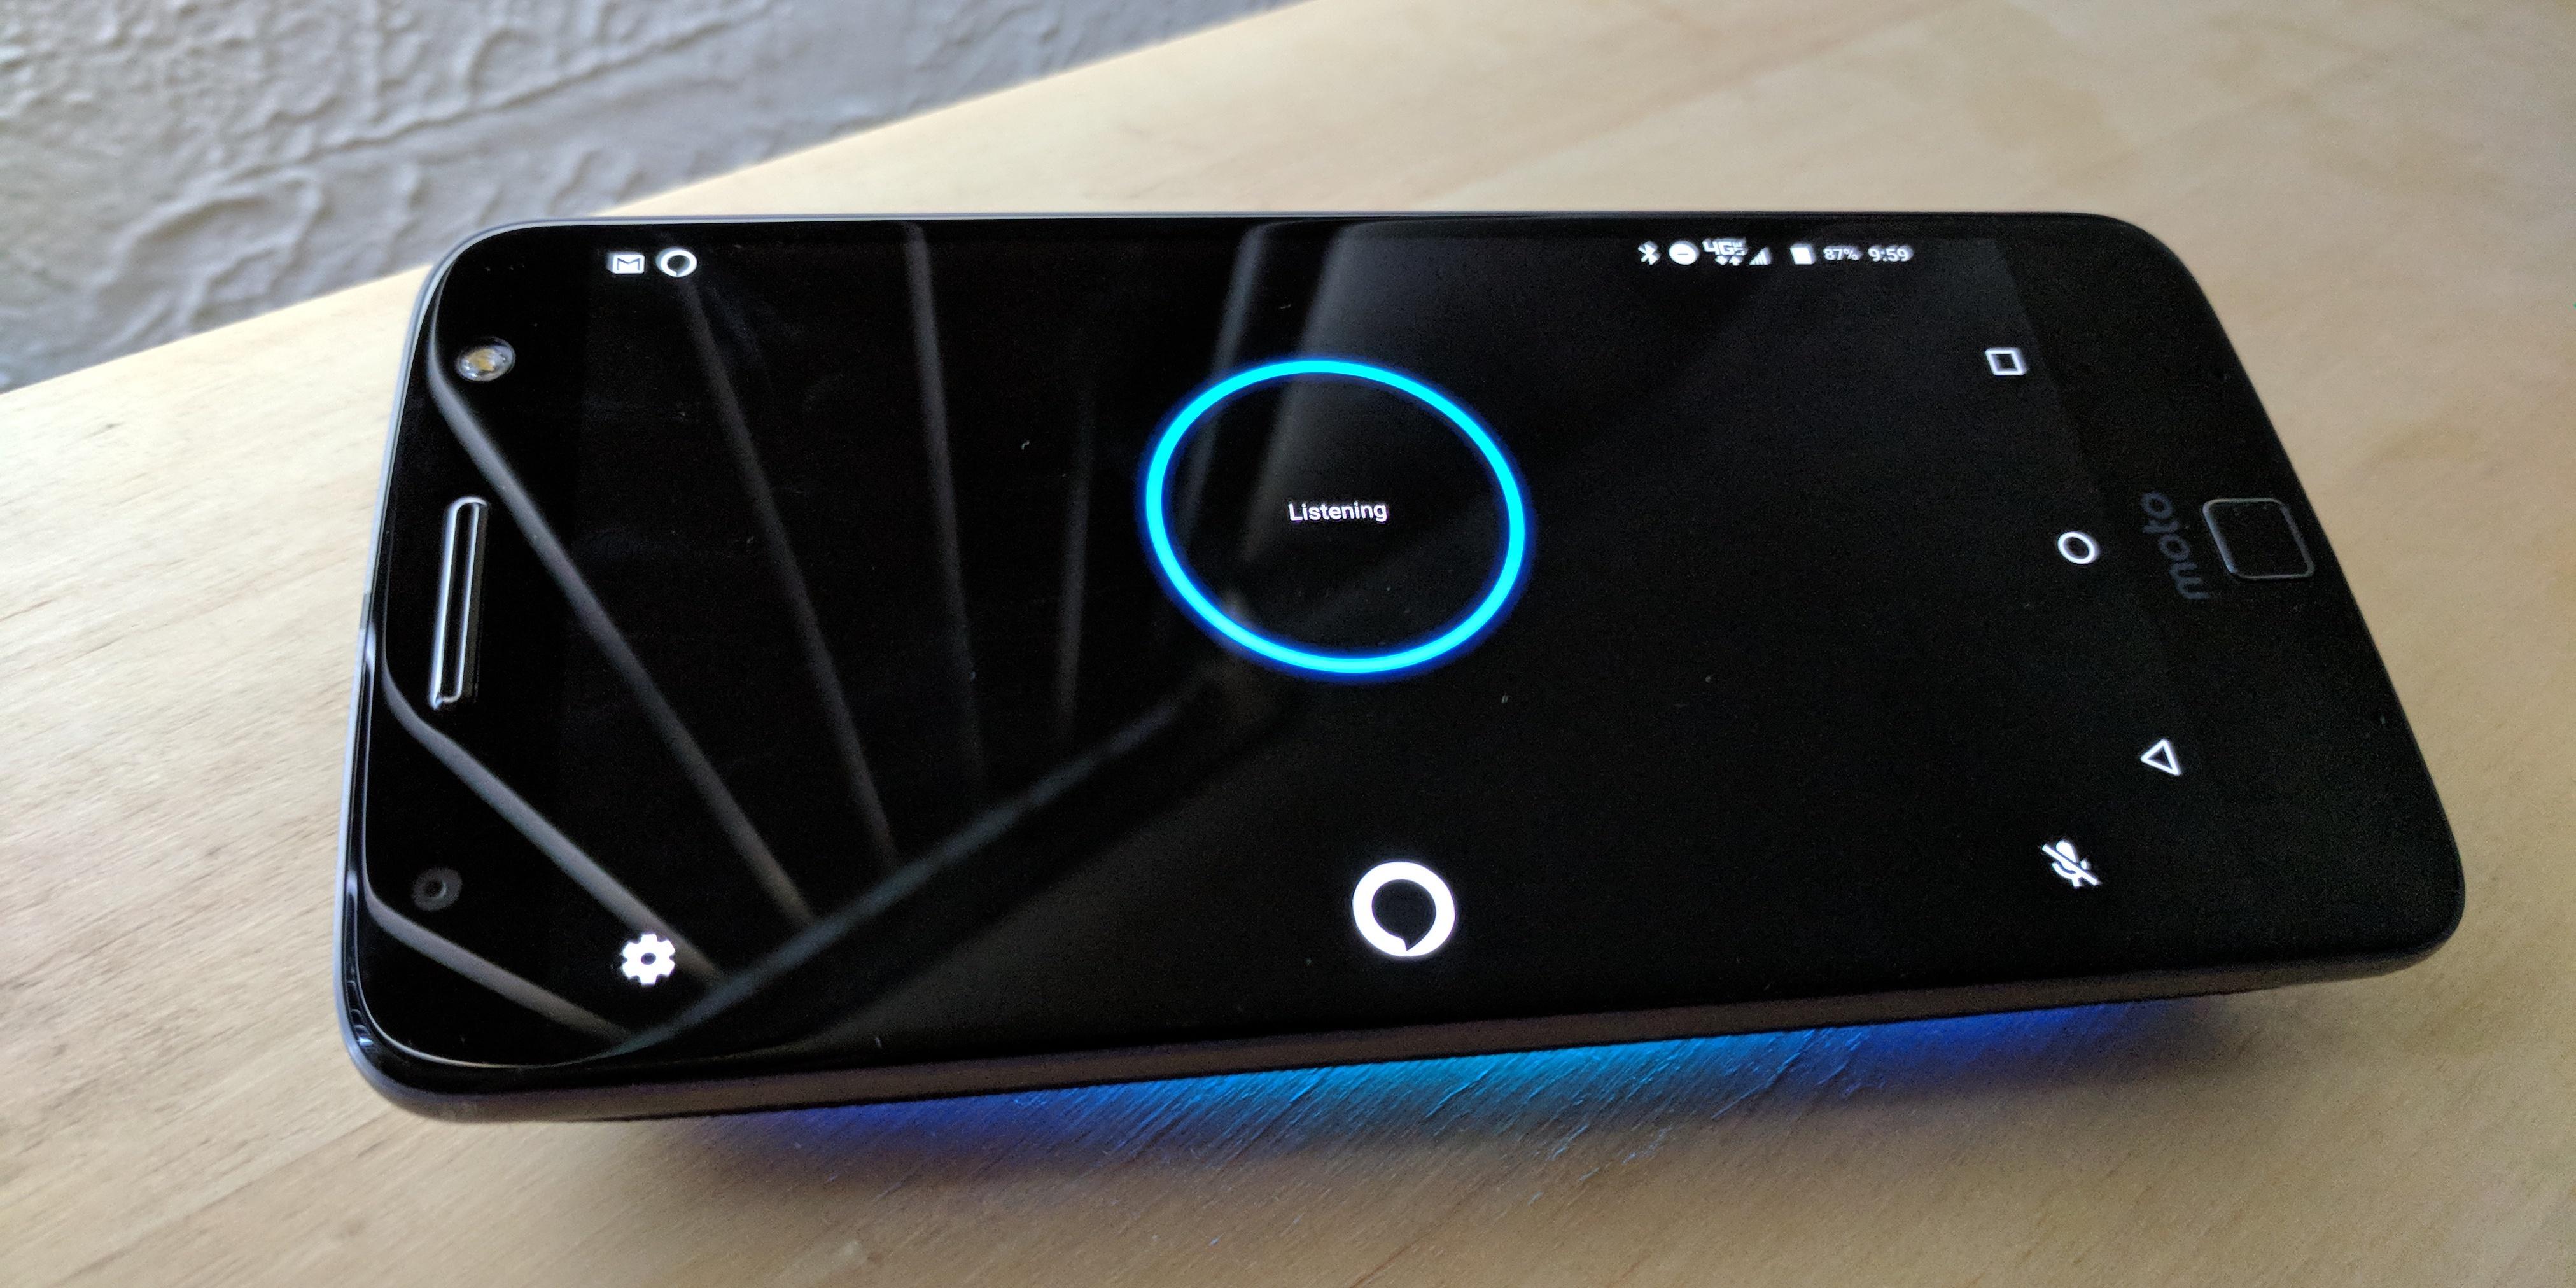 Review: Moto Smart Speaker w/ Amazon Alexa has questionable